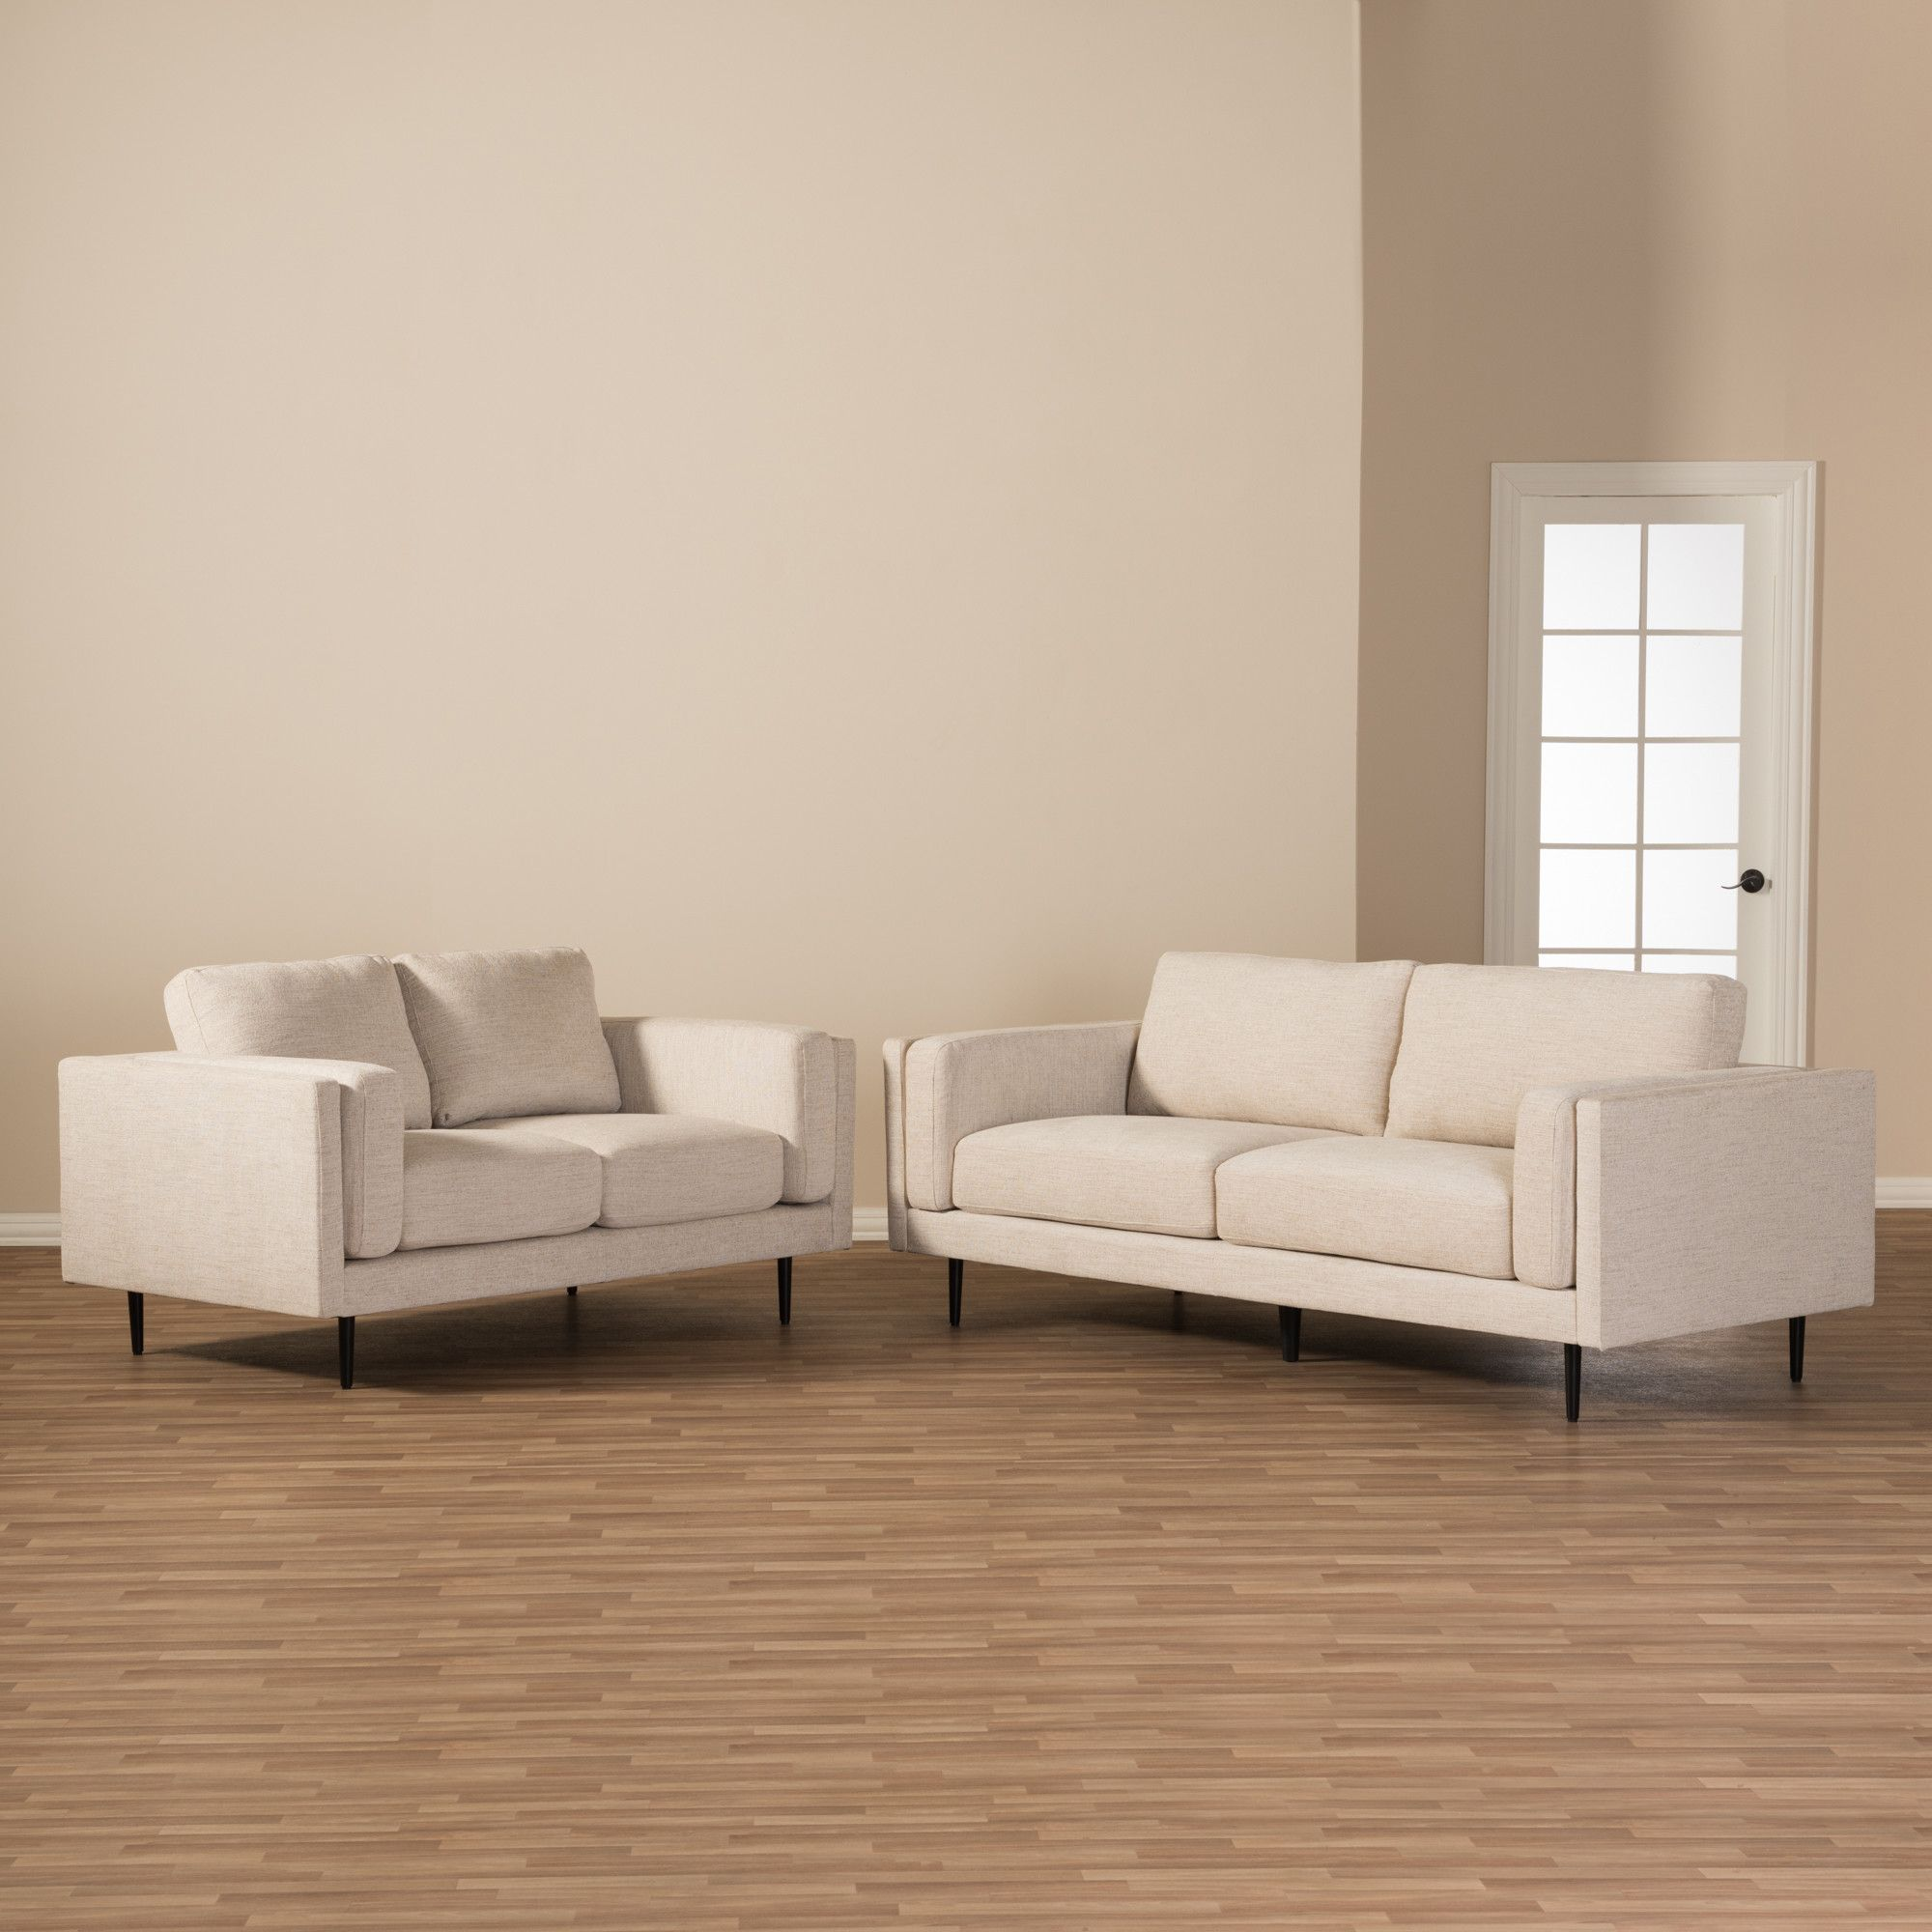 Baxton Studio Brittany Retro Mid-Century 2 Piece Living Room Set ...